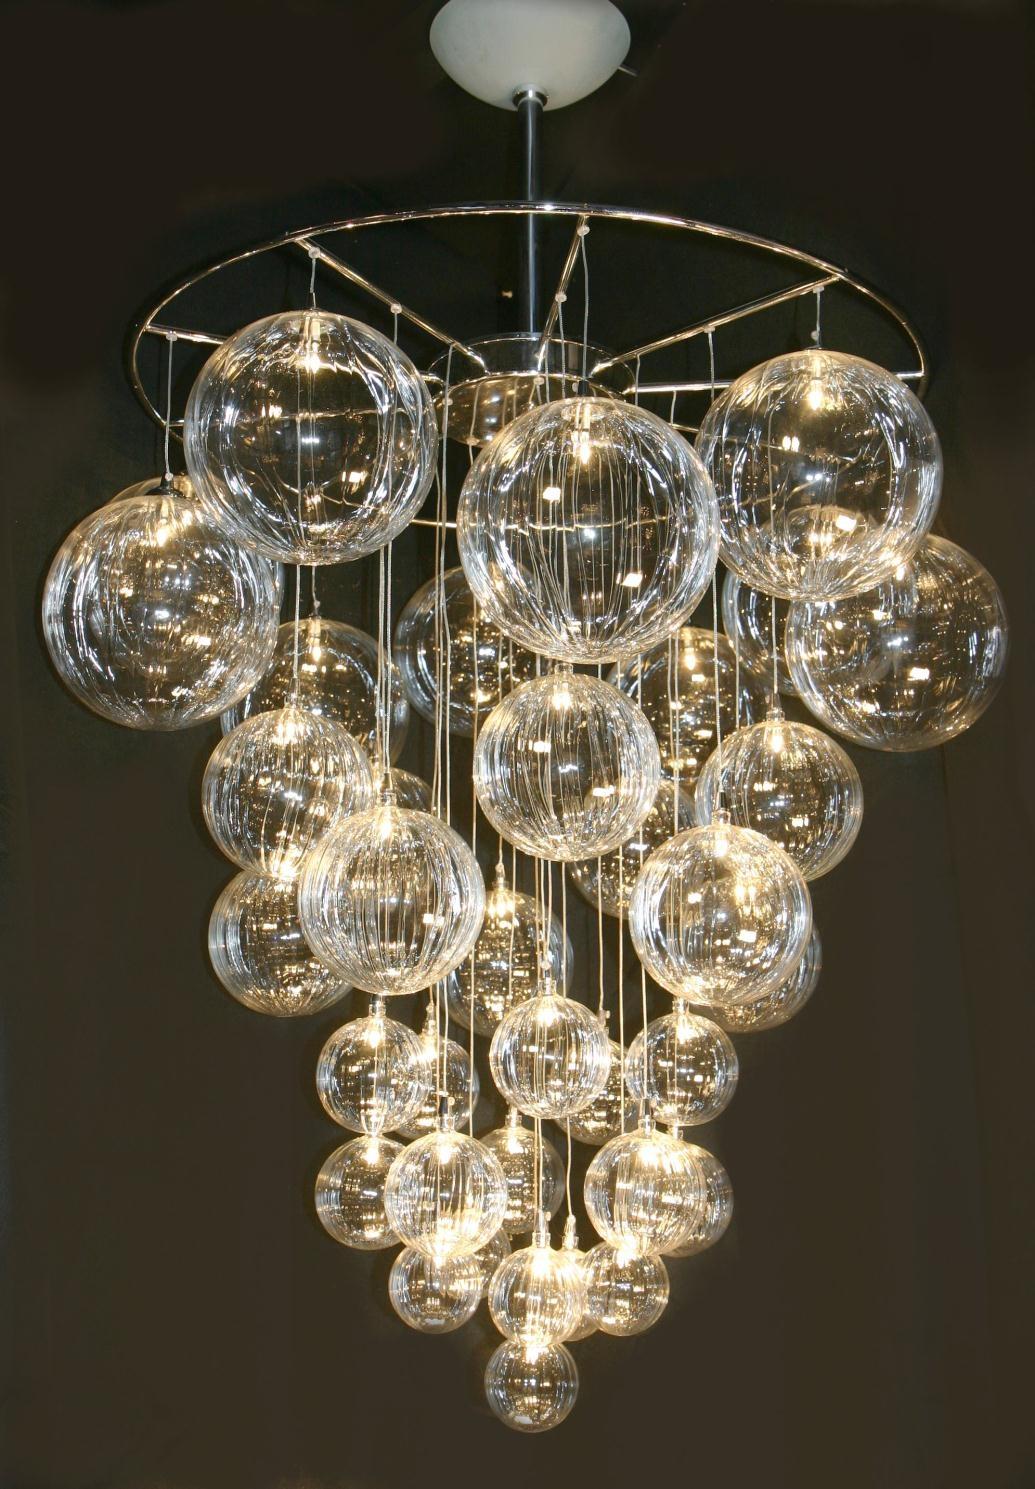 Modern Lights Chandeliers For Modern Light Chandelier (Image 9 of 15)